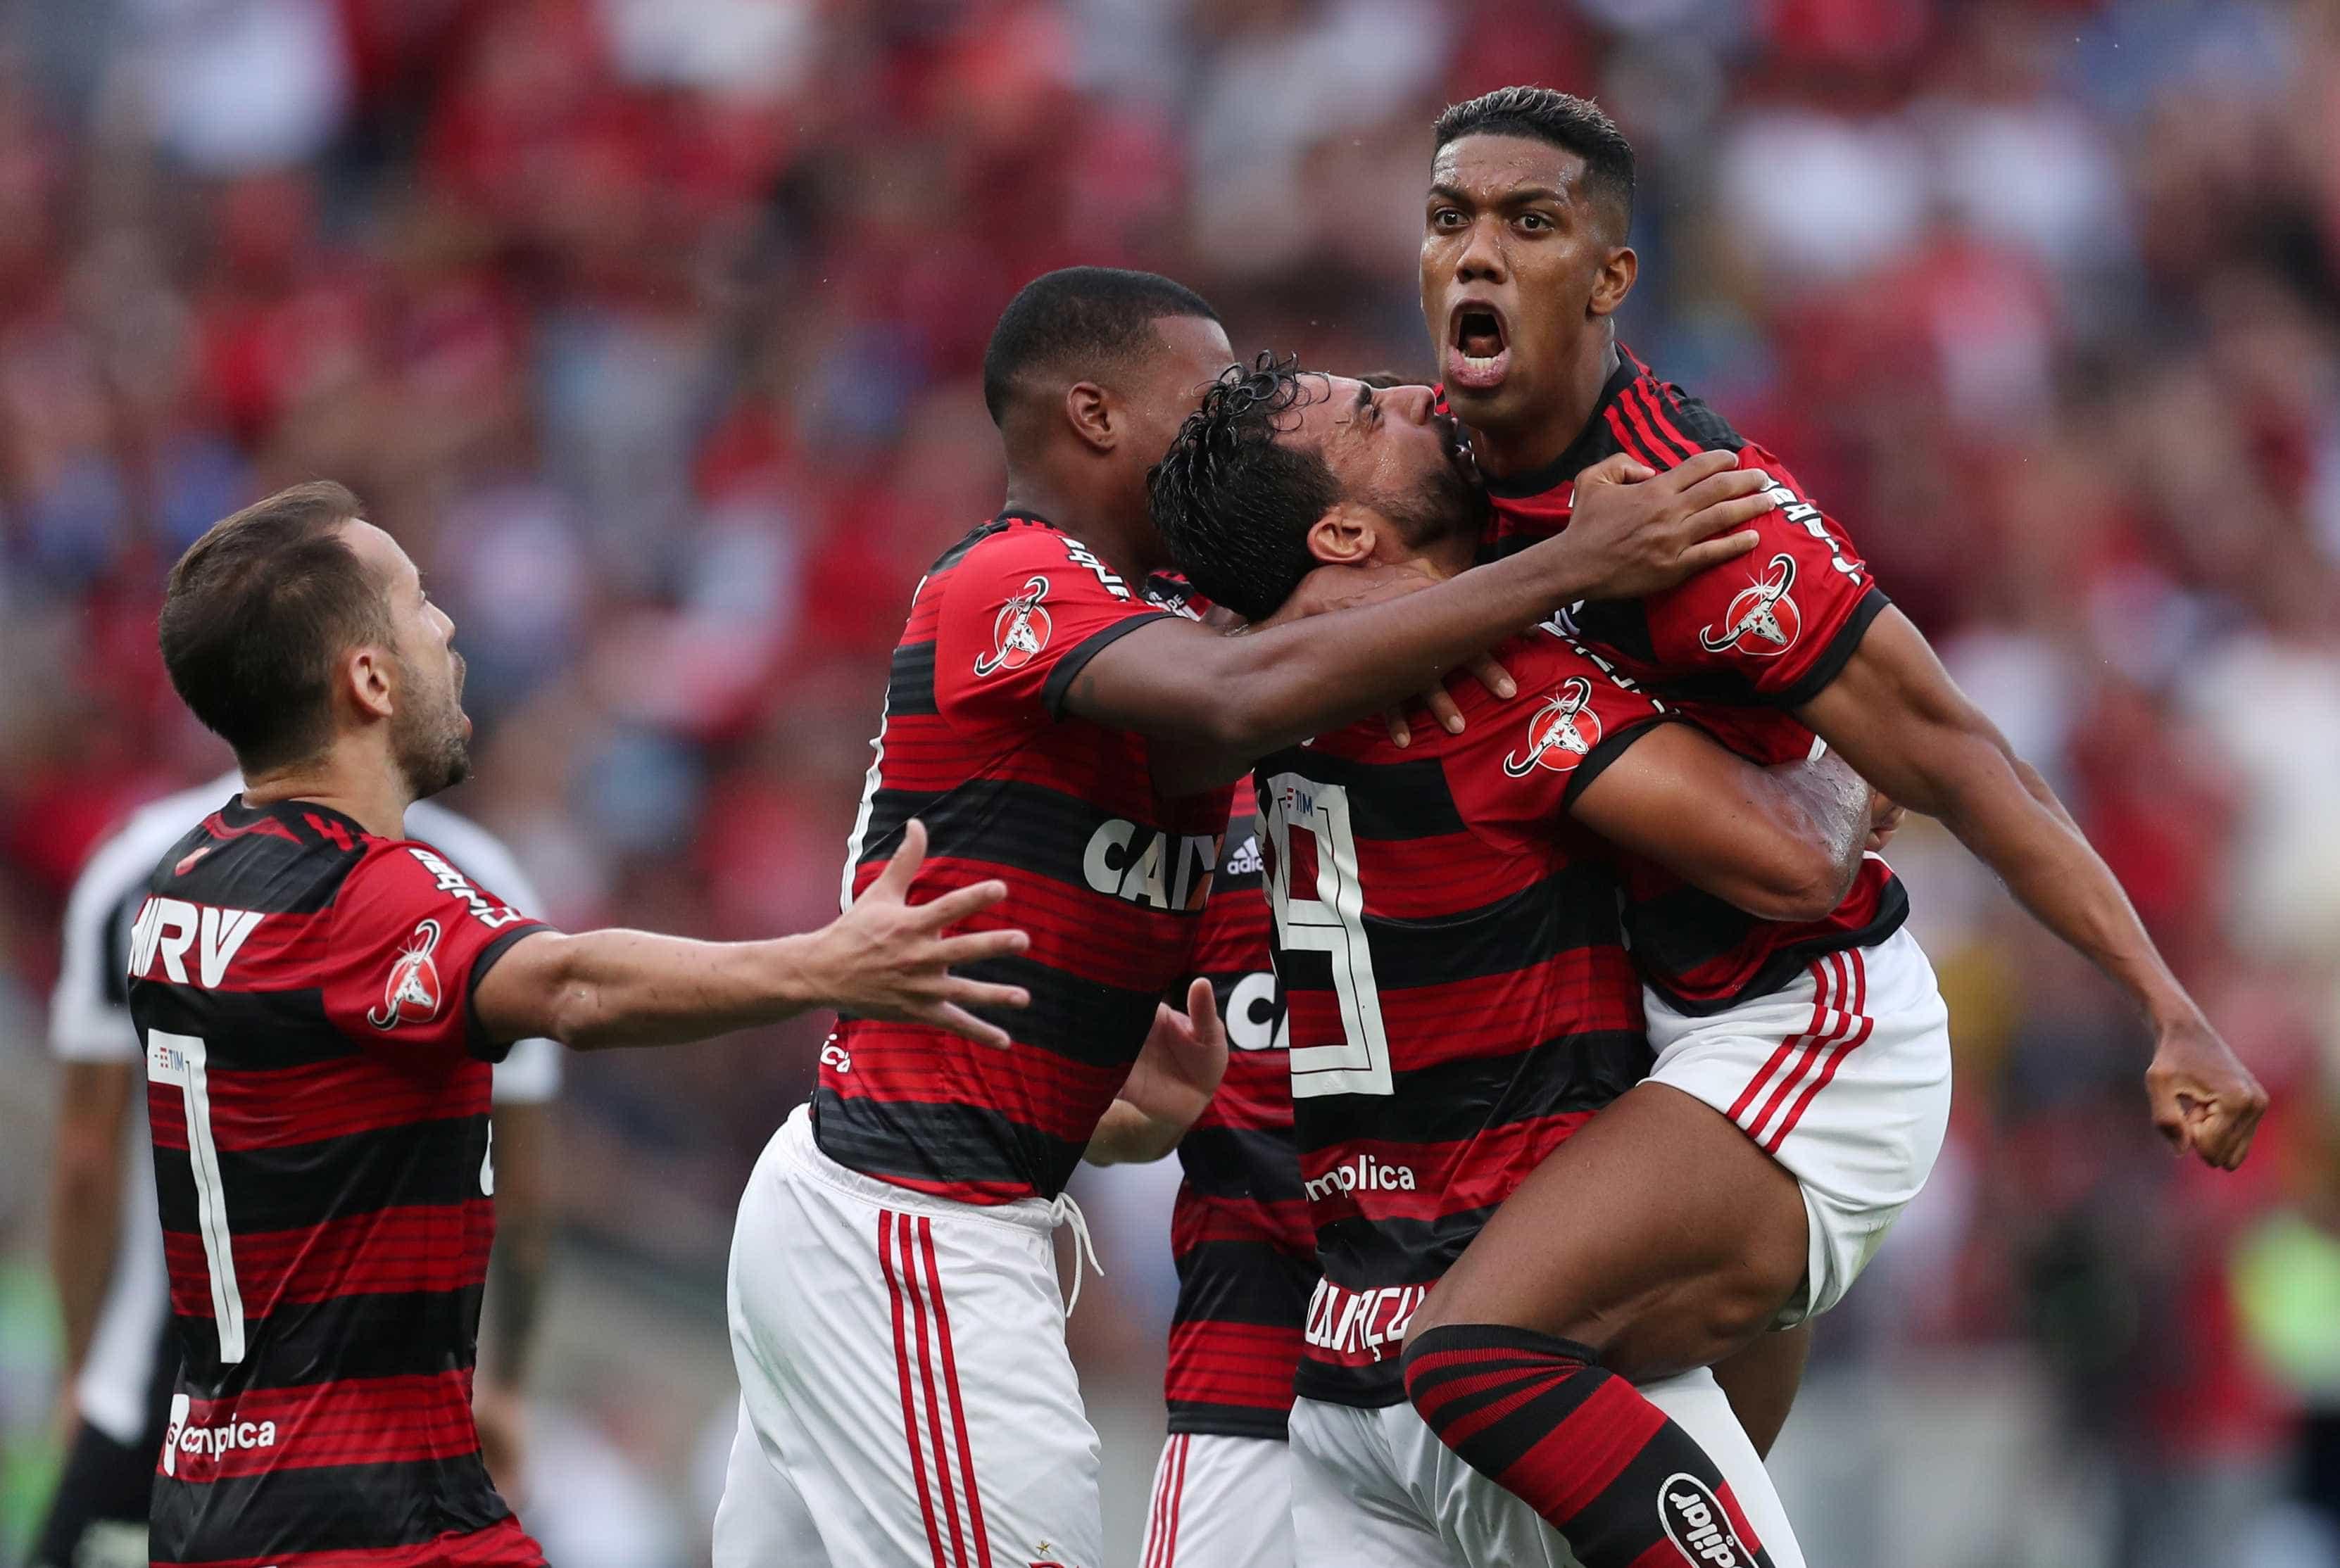 Dourado marca, César defende pênalti e Flamengo bate o Santos